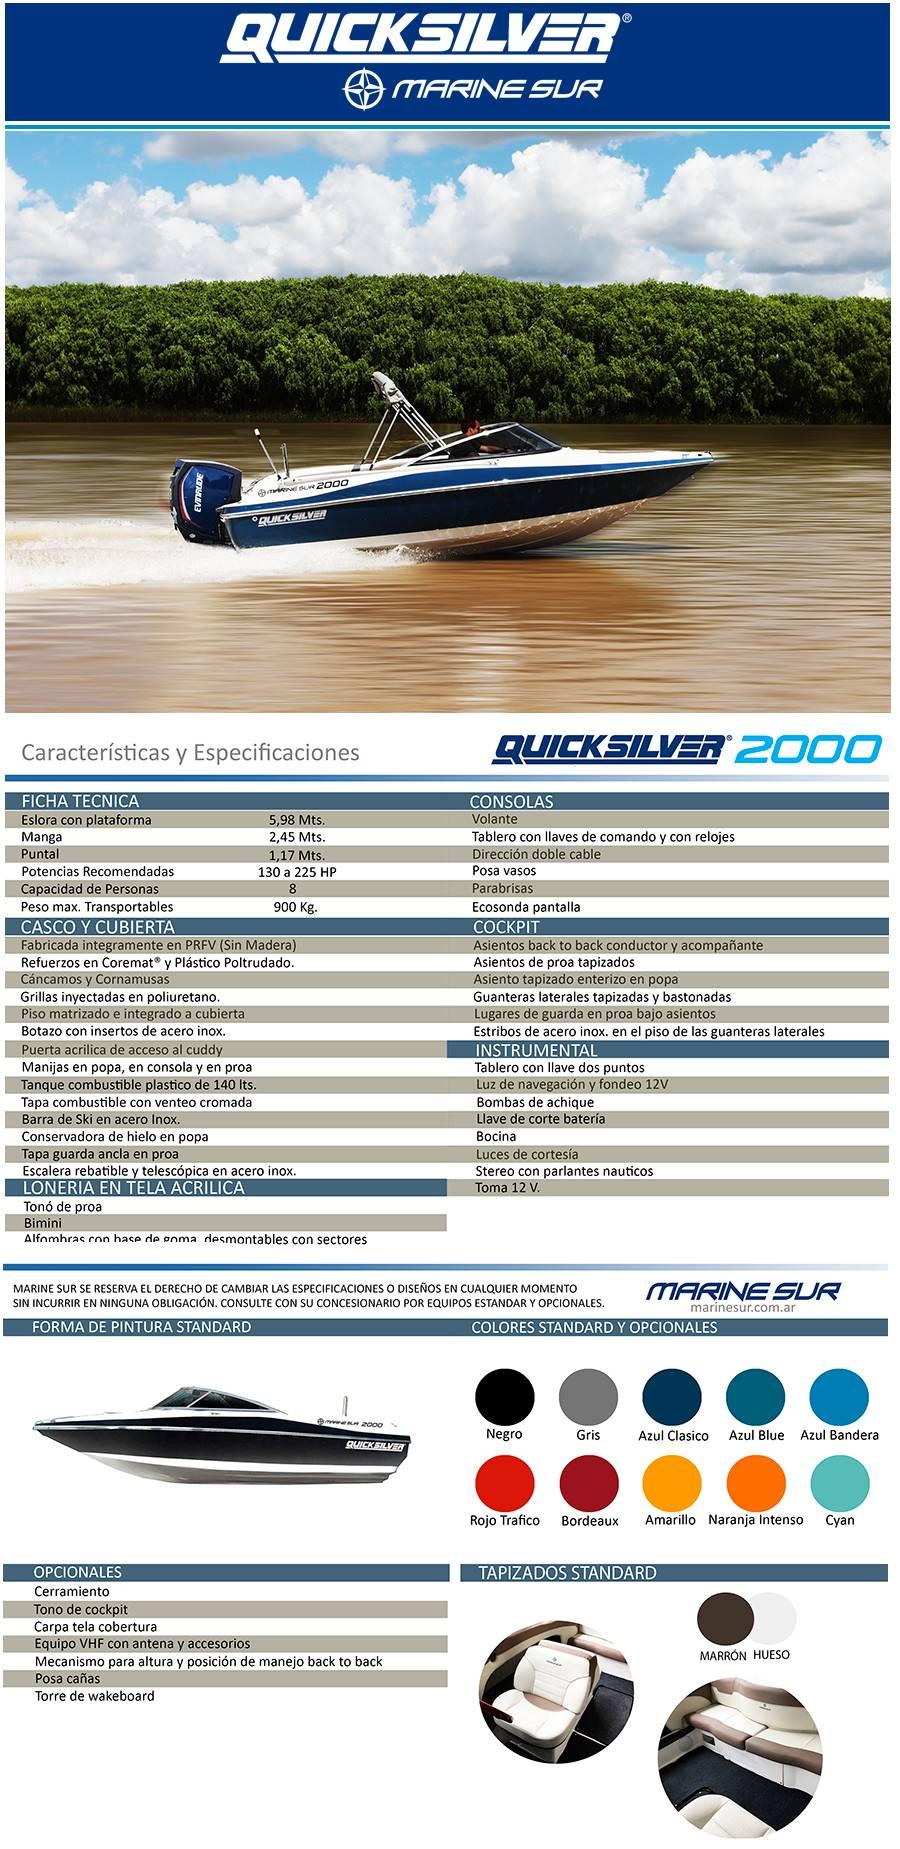 Quicksilver Marine Sur Mercado libre